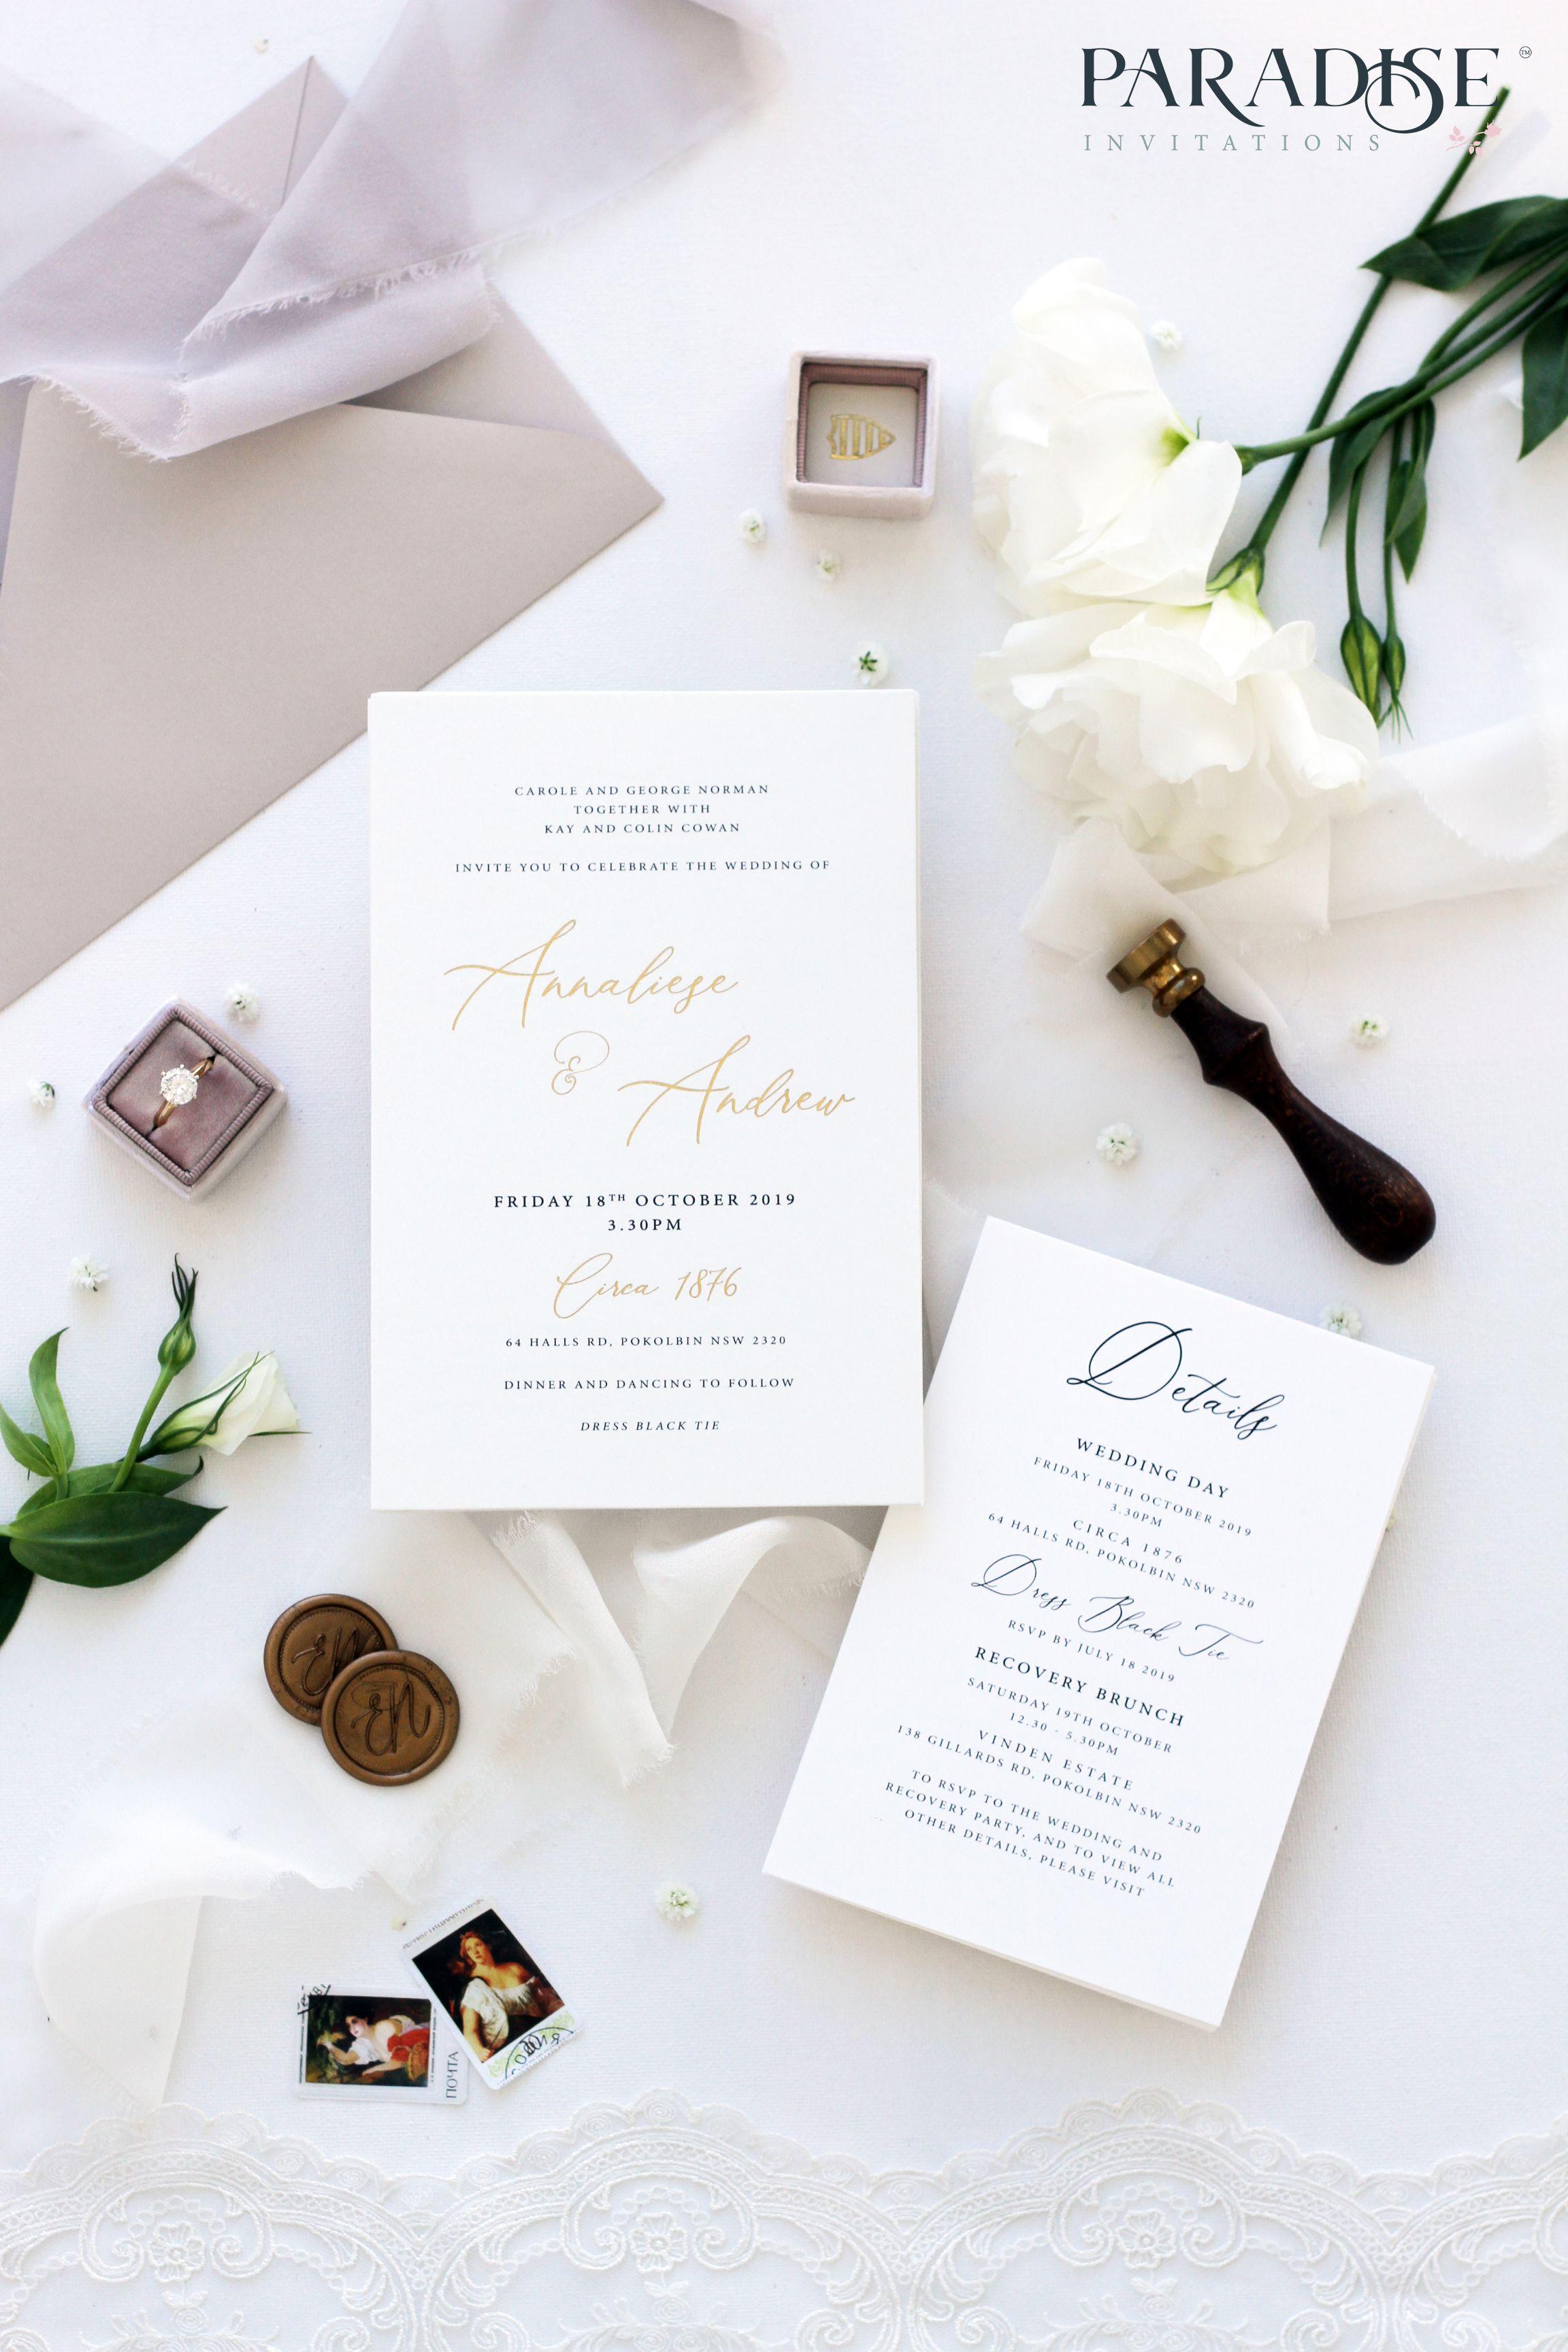 Euphrasie Golden Foil Wedding Invitation Wedding Invitation Weddinginv Foil Wedding Invitations Free Wedding Invitation Samples Colorful Wedding Invitations